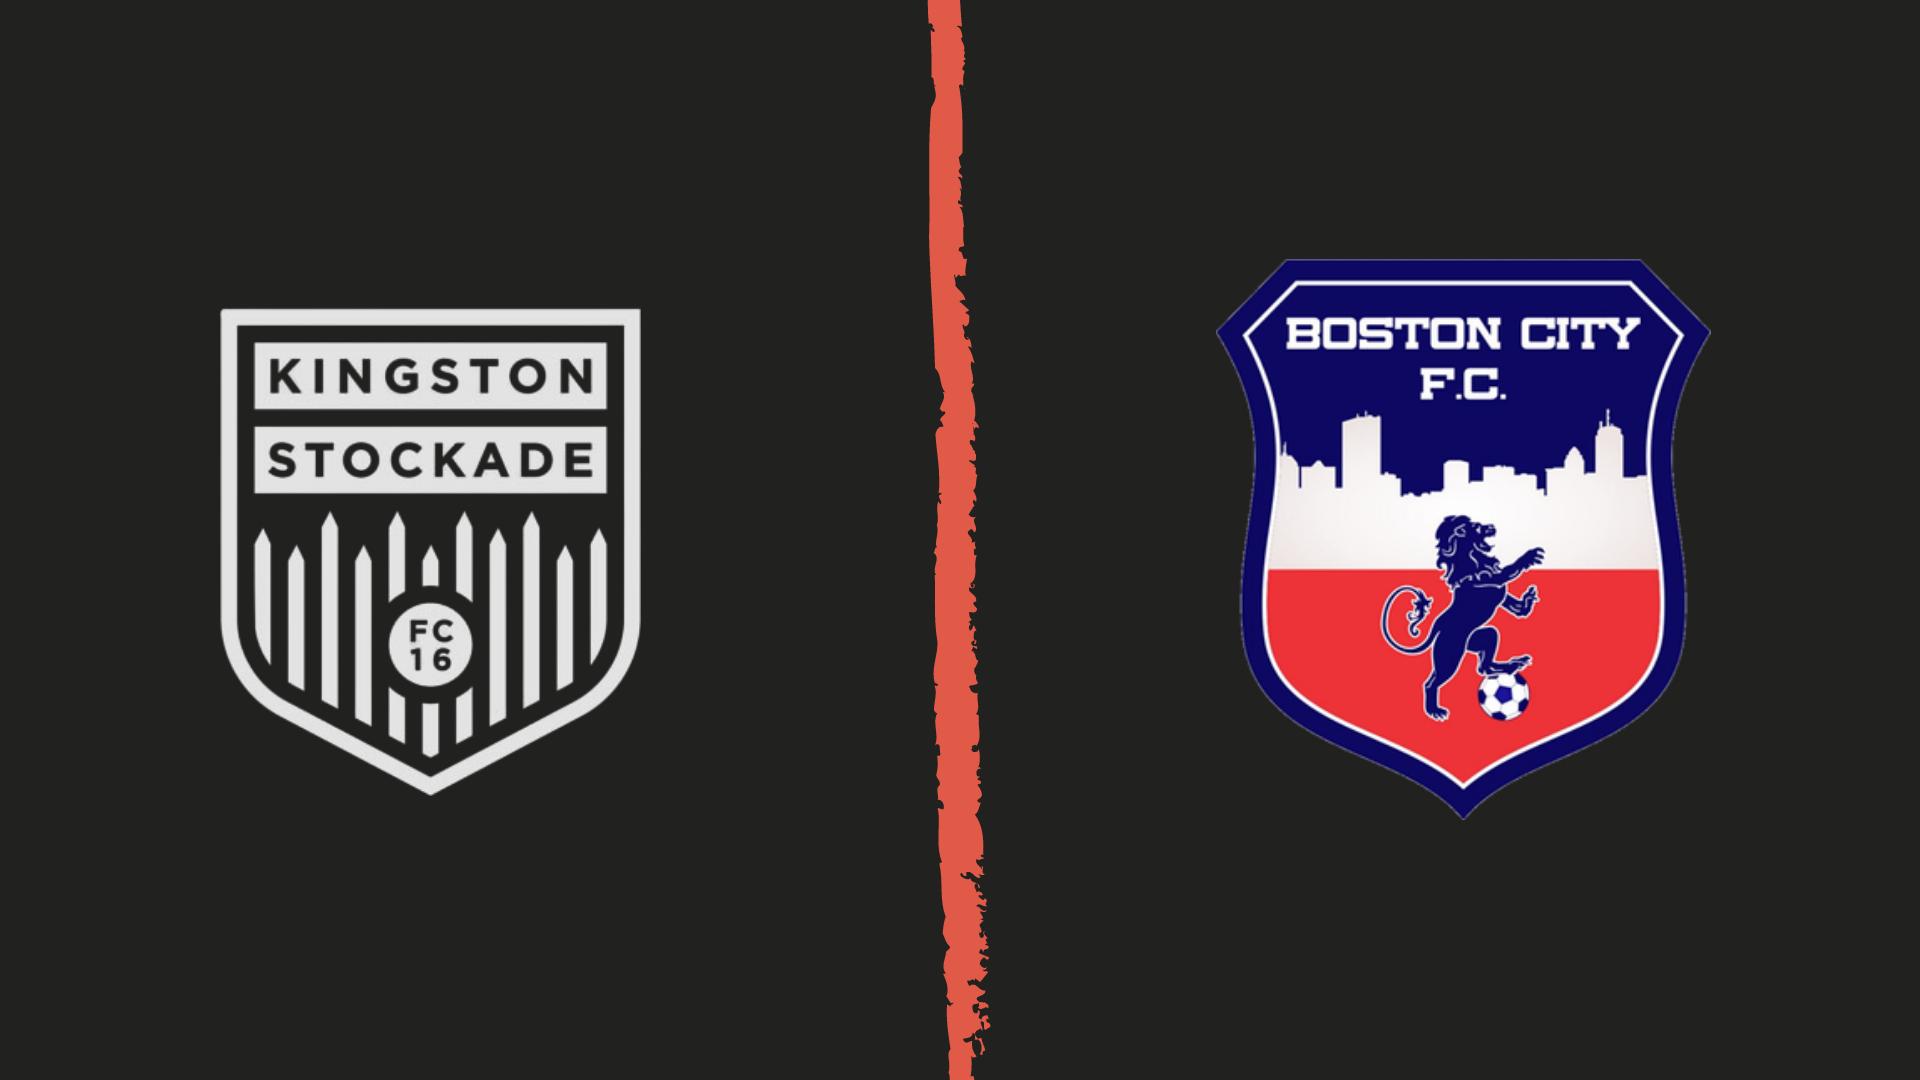 Kingston Stockade FC vs Boston City FC